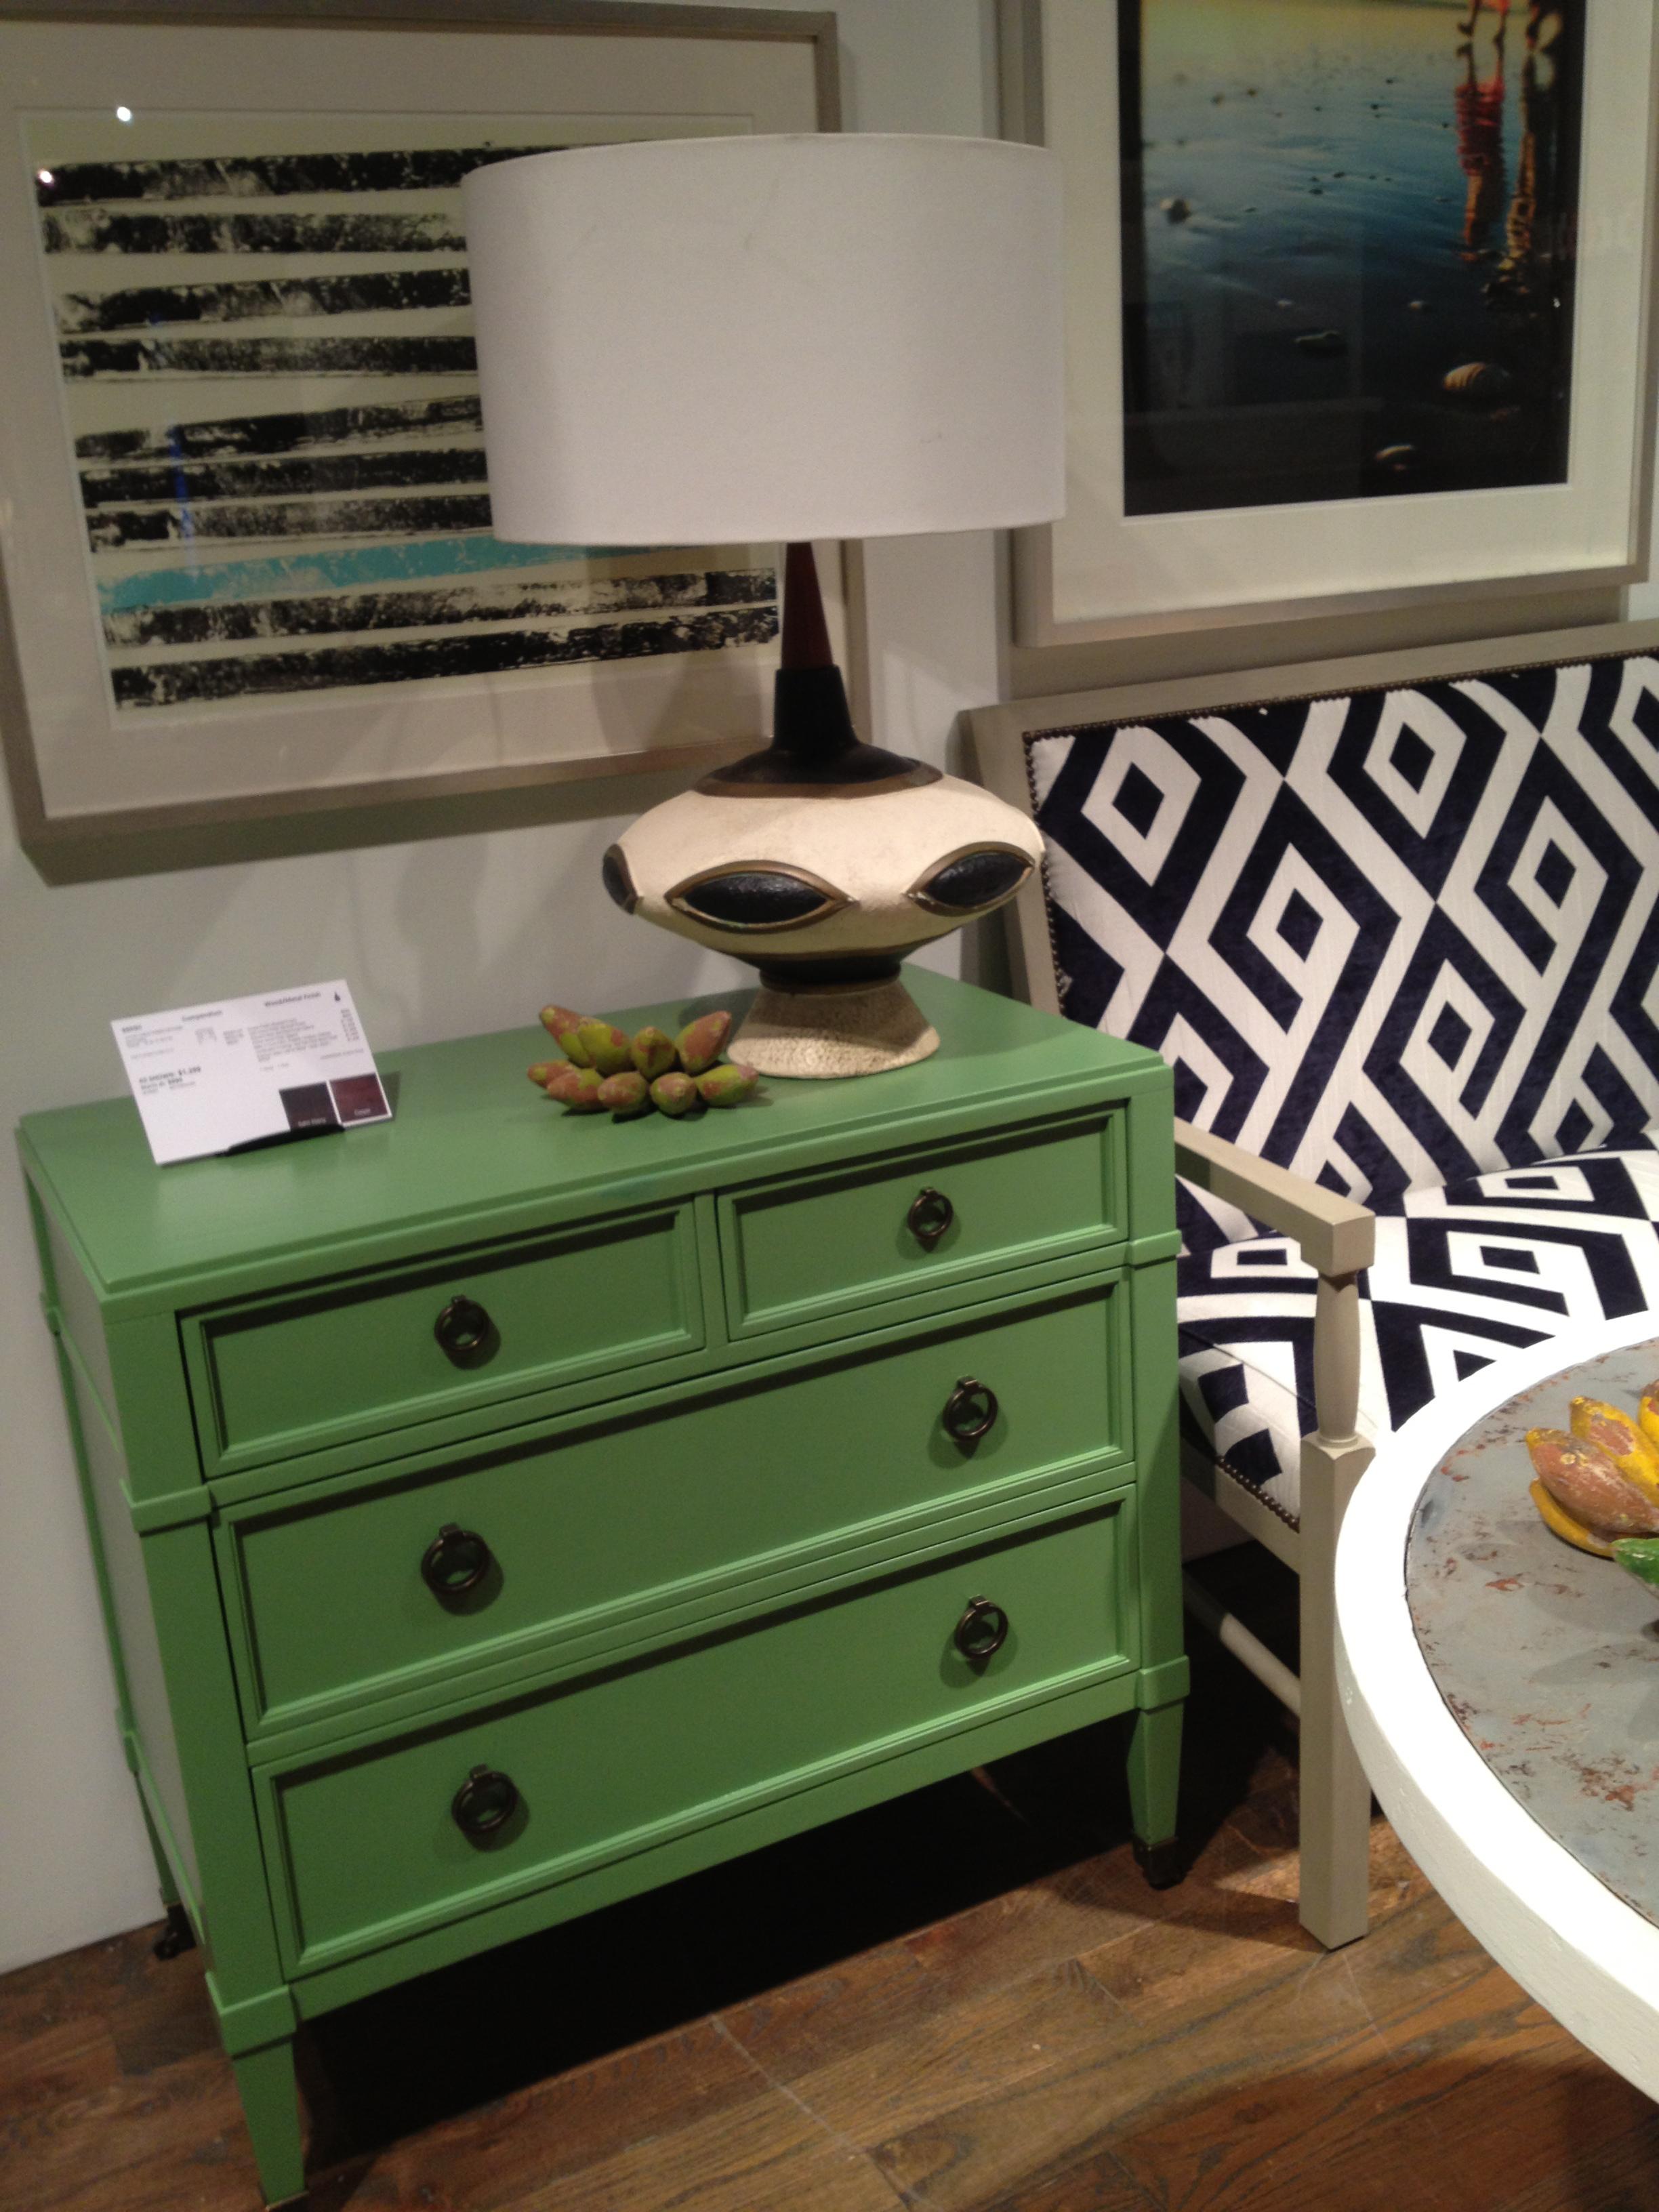 Green Chest at Vanguard Furniture Spring 2013 #hpmkt